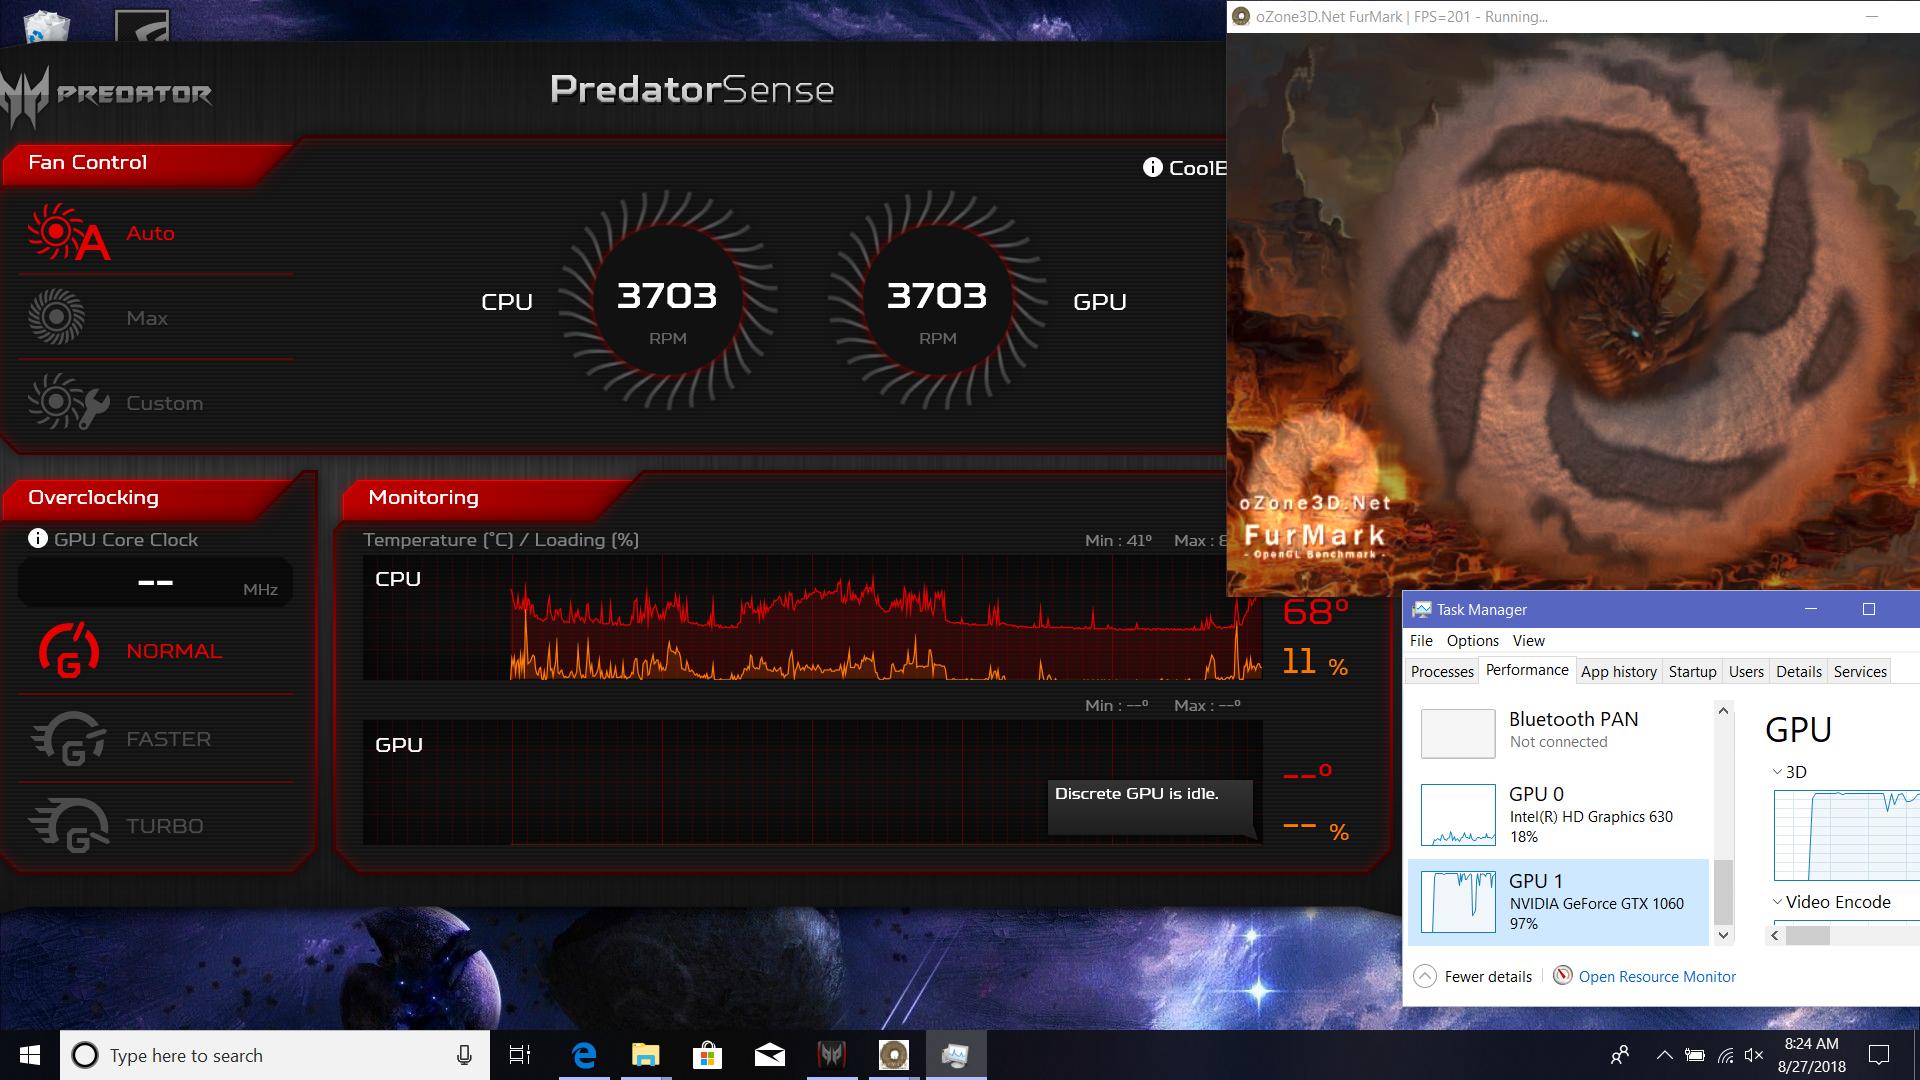 Predator sense Bug, I can't see the GPU Clocks/Temperatures/Usage in